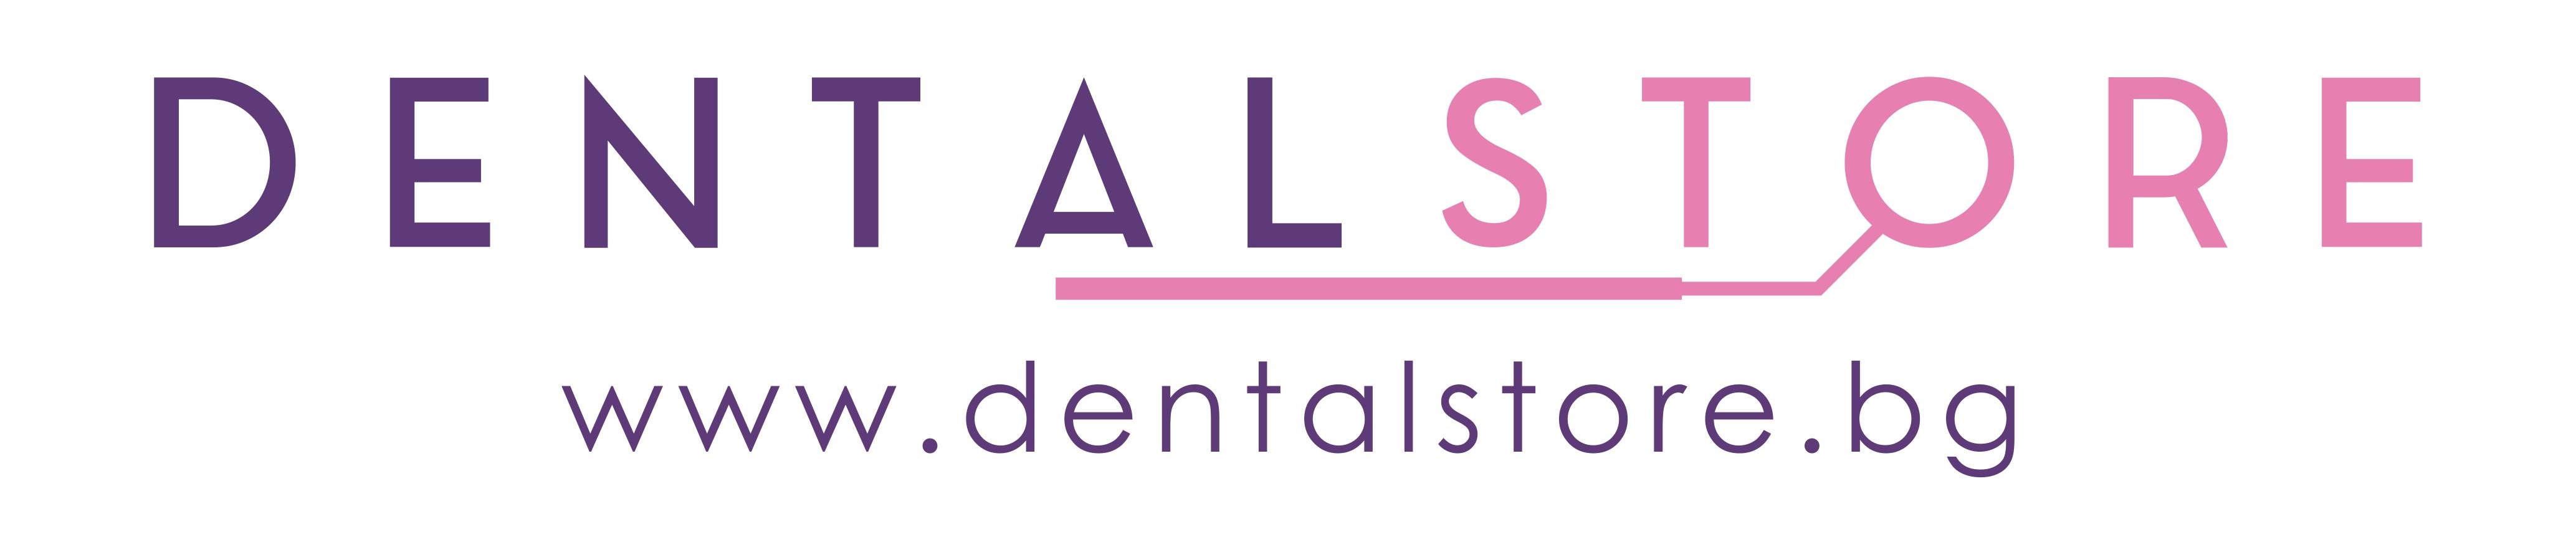 Dental store